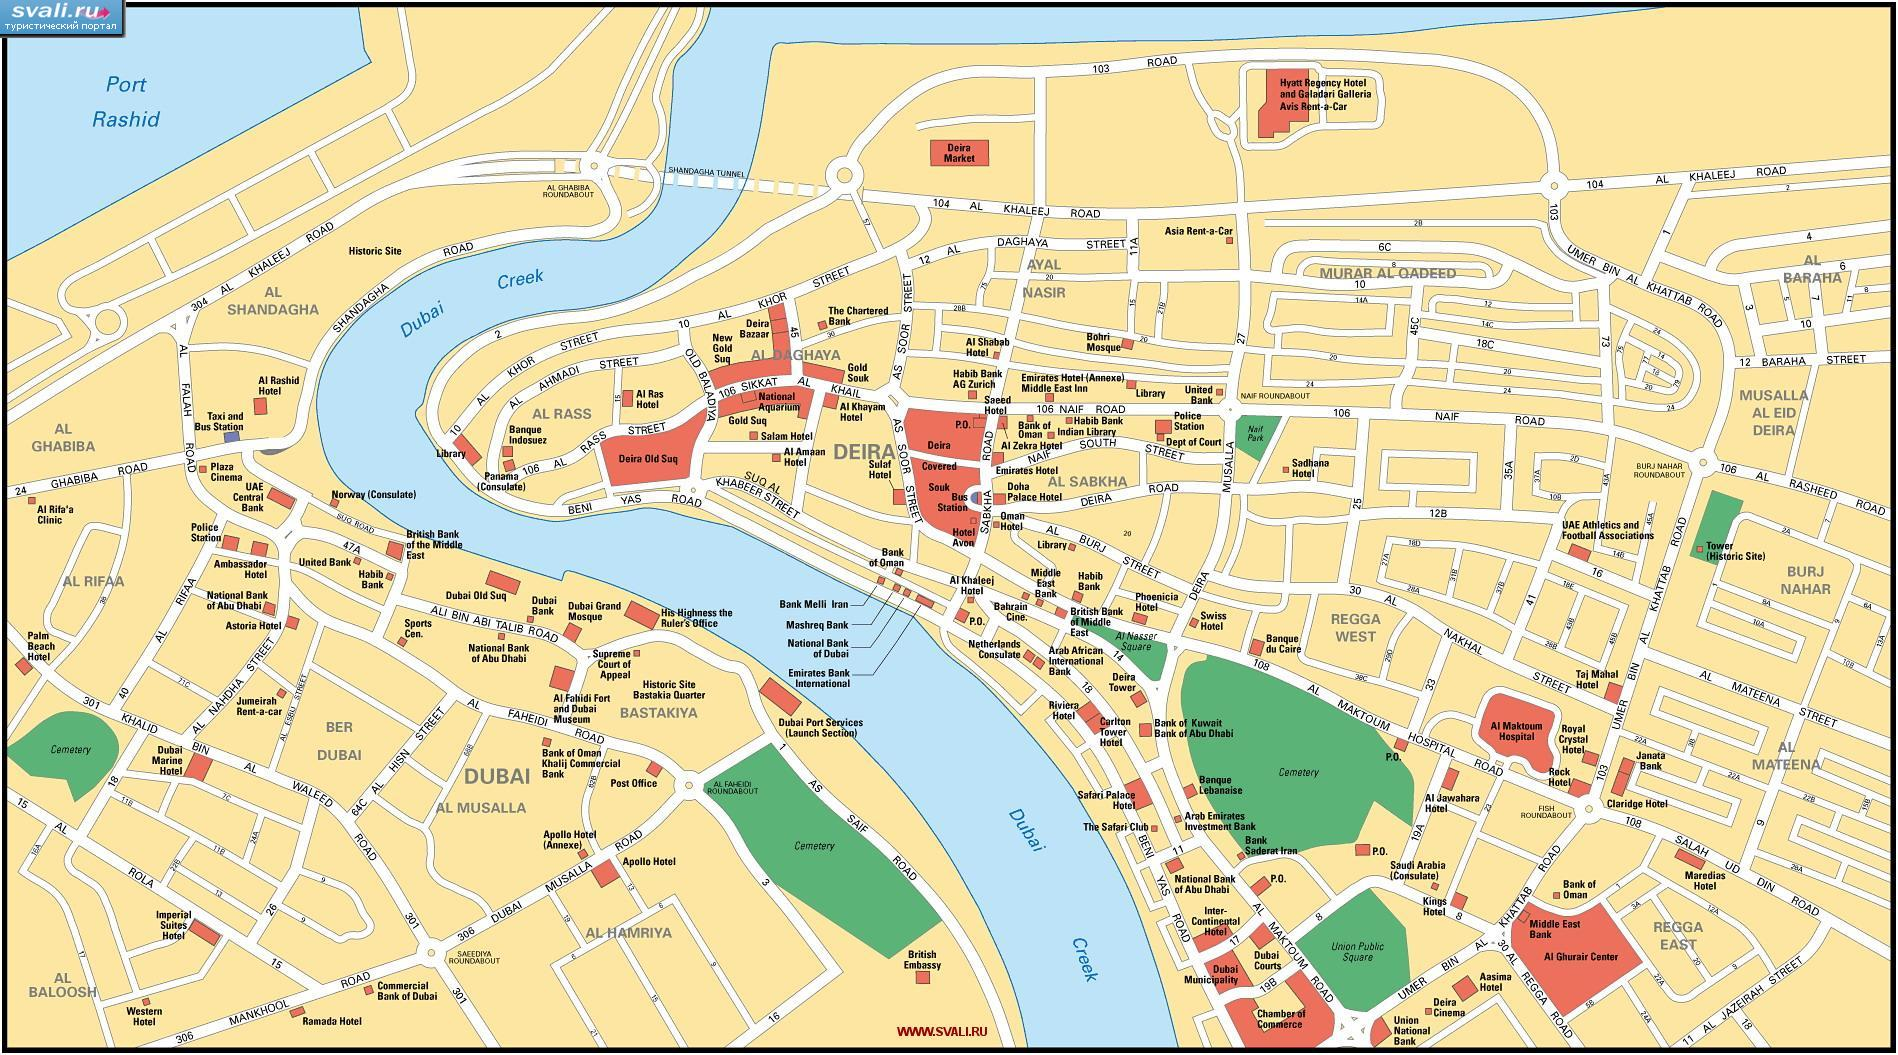 карты : Туристическая карта центра Дубай, ОАЭ (англ.) | ОАЭ ...